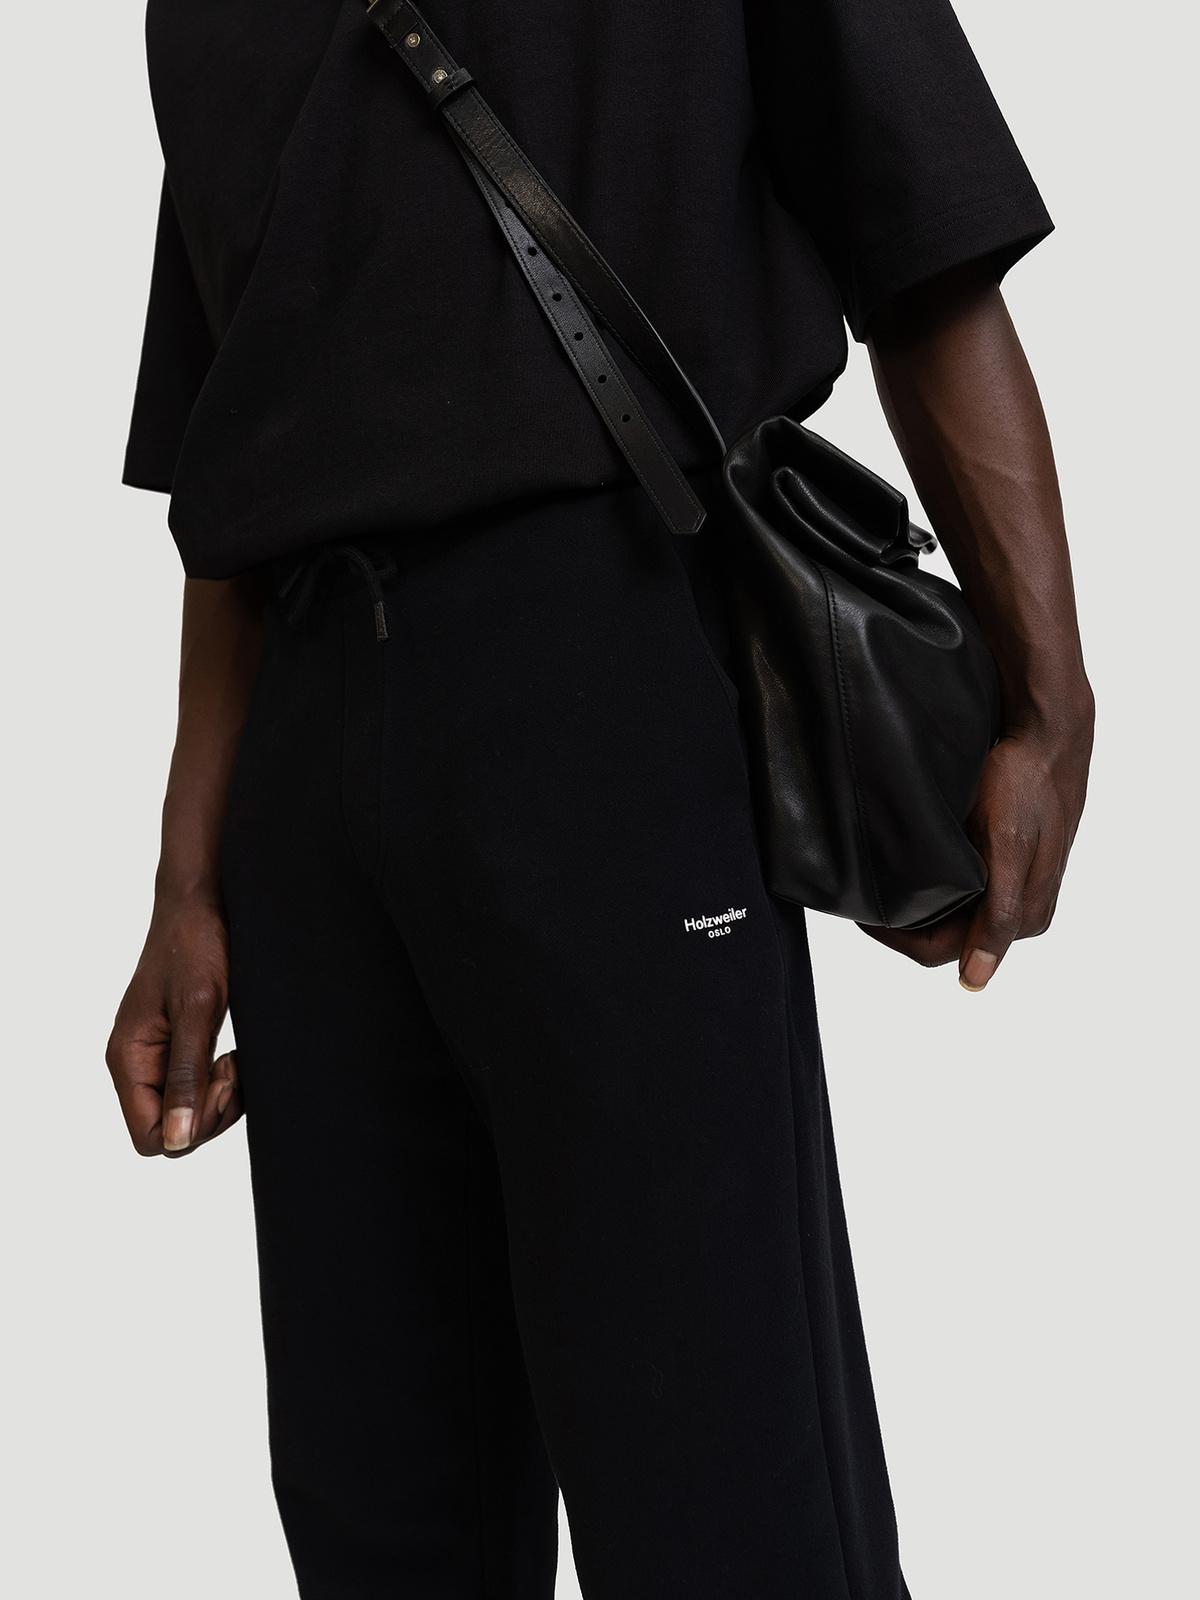 M. Oslo Sweat Trouser Black 7